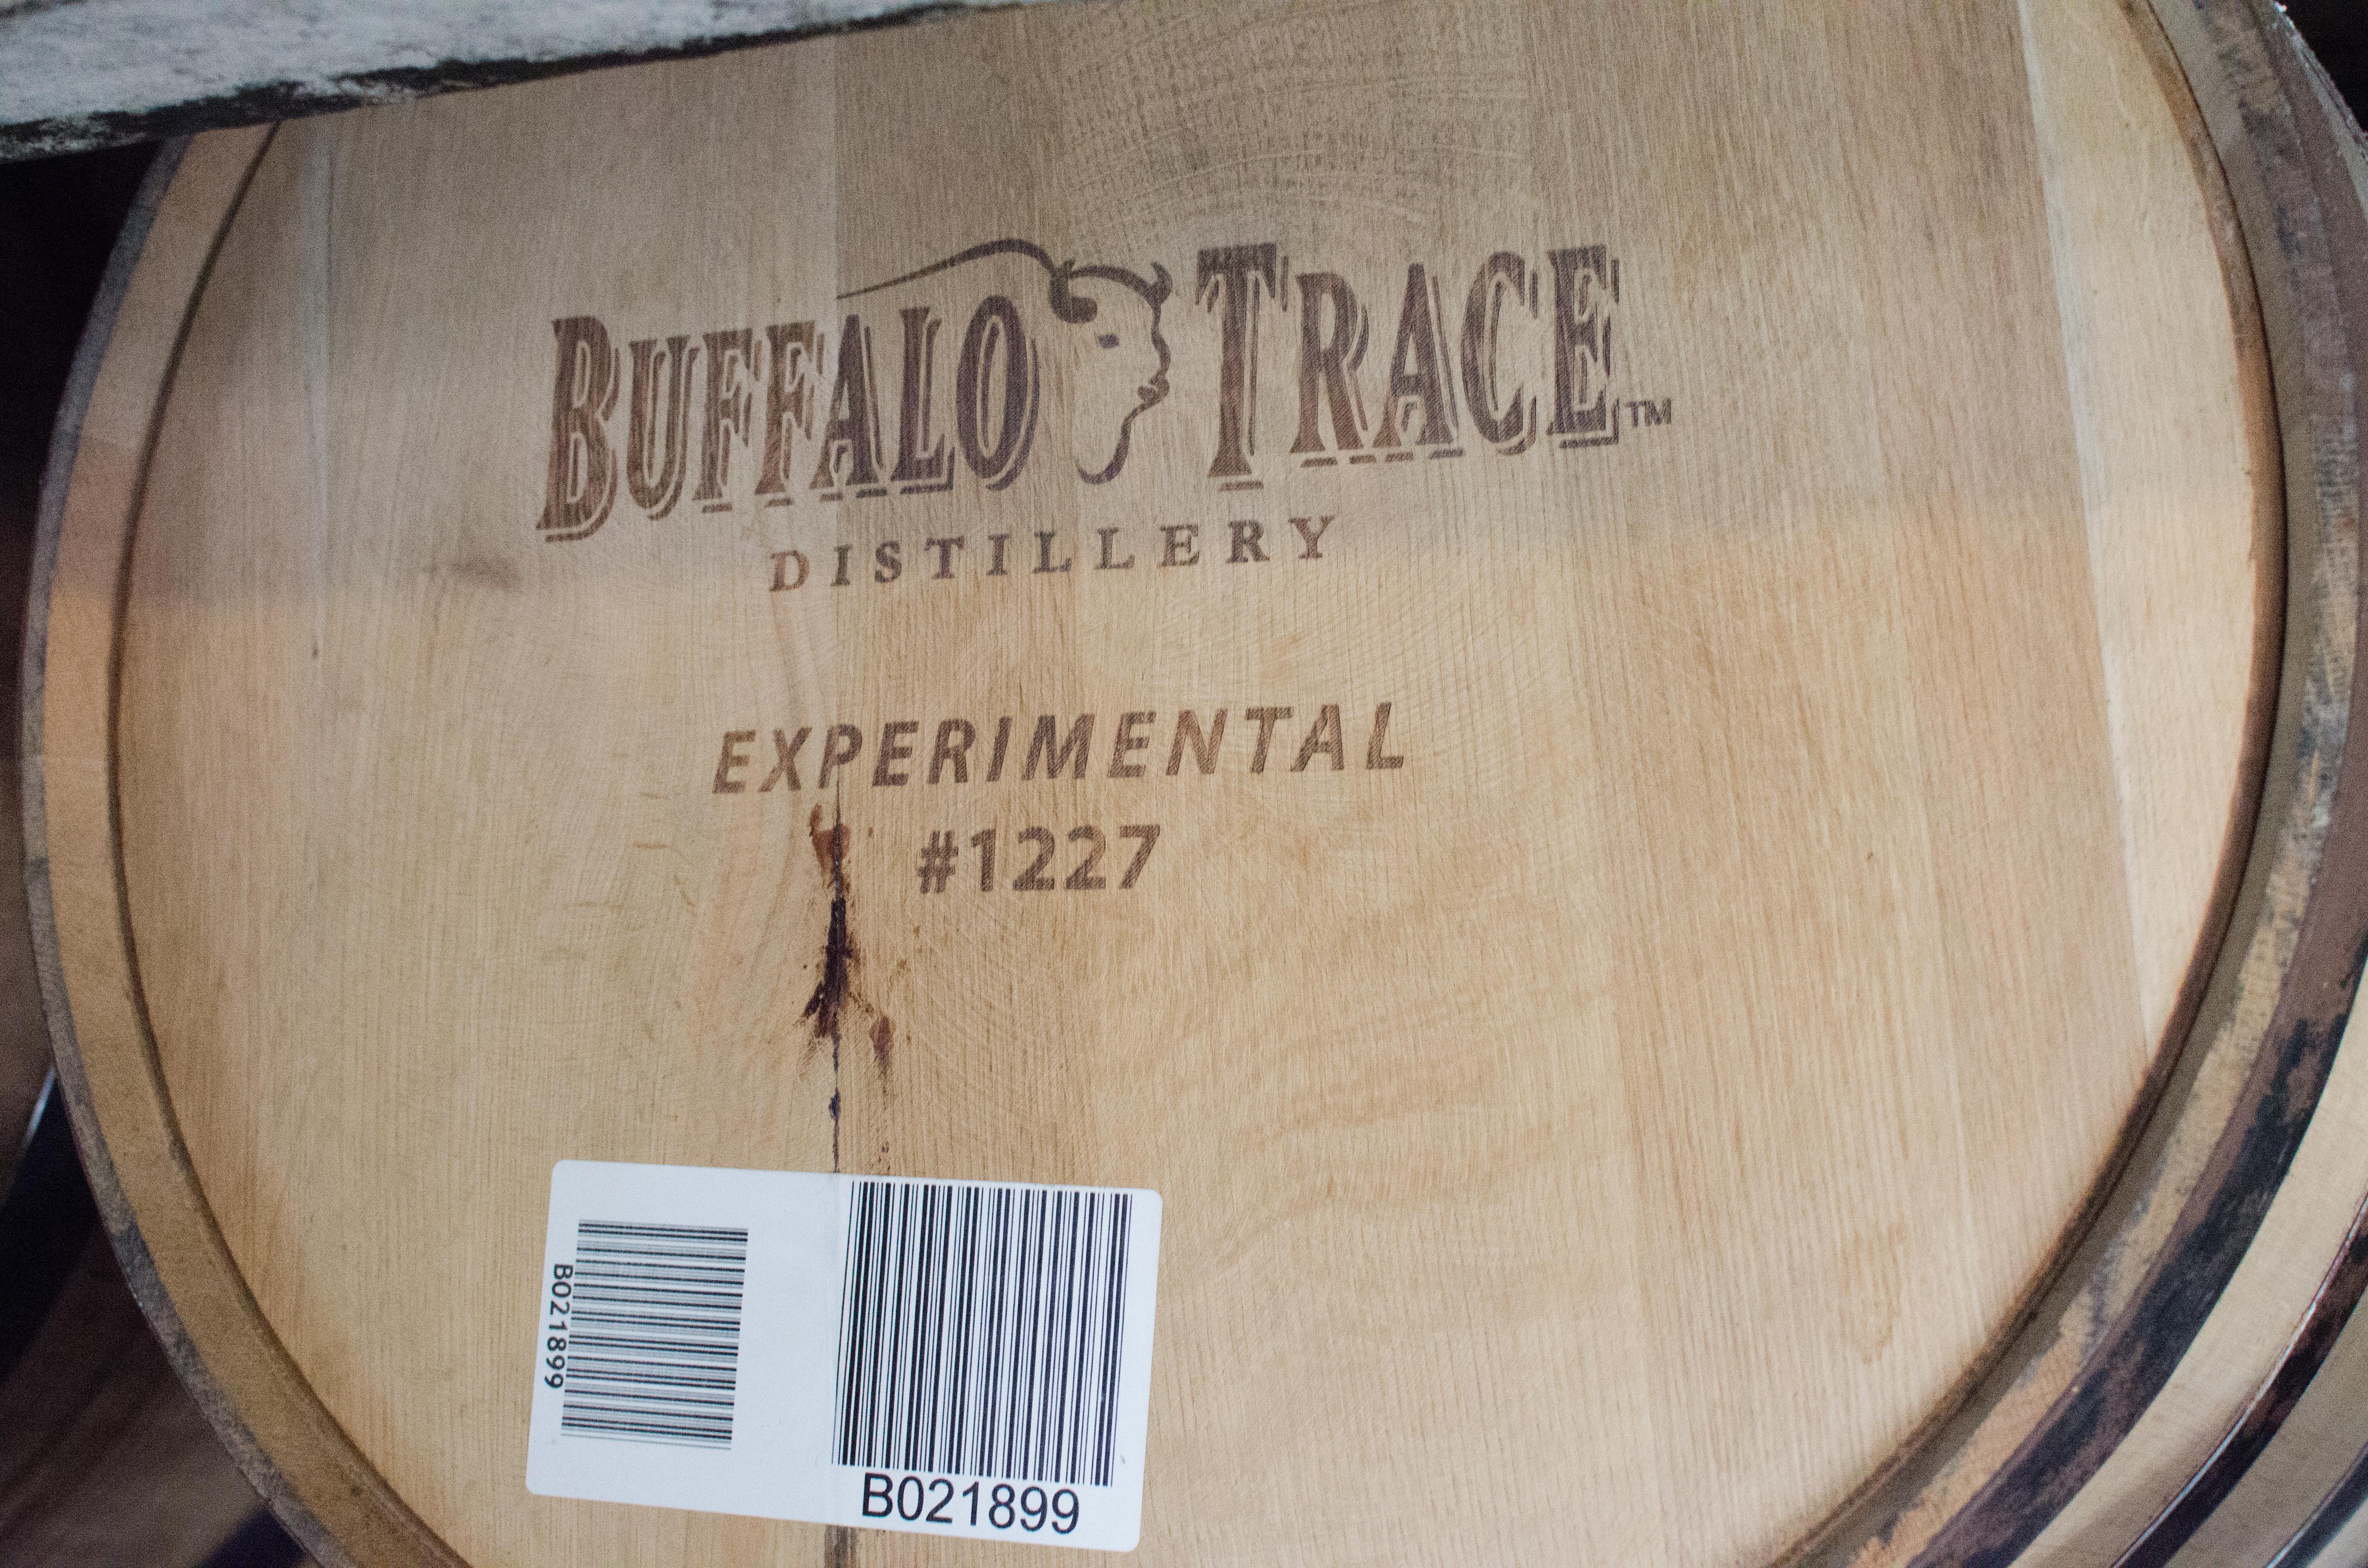 buffalotrace_004